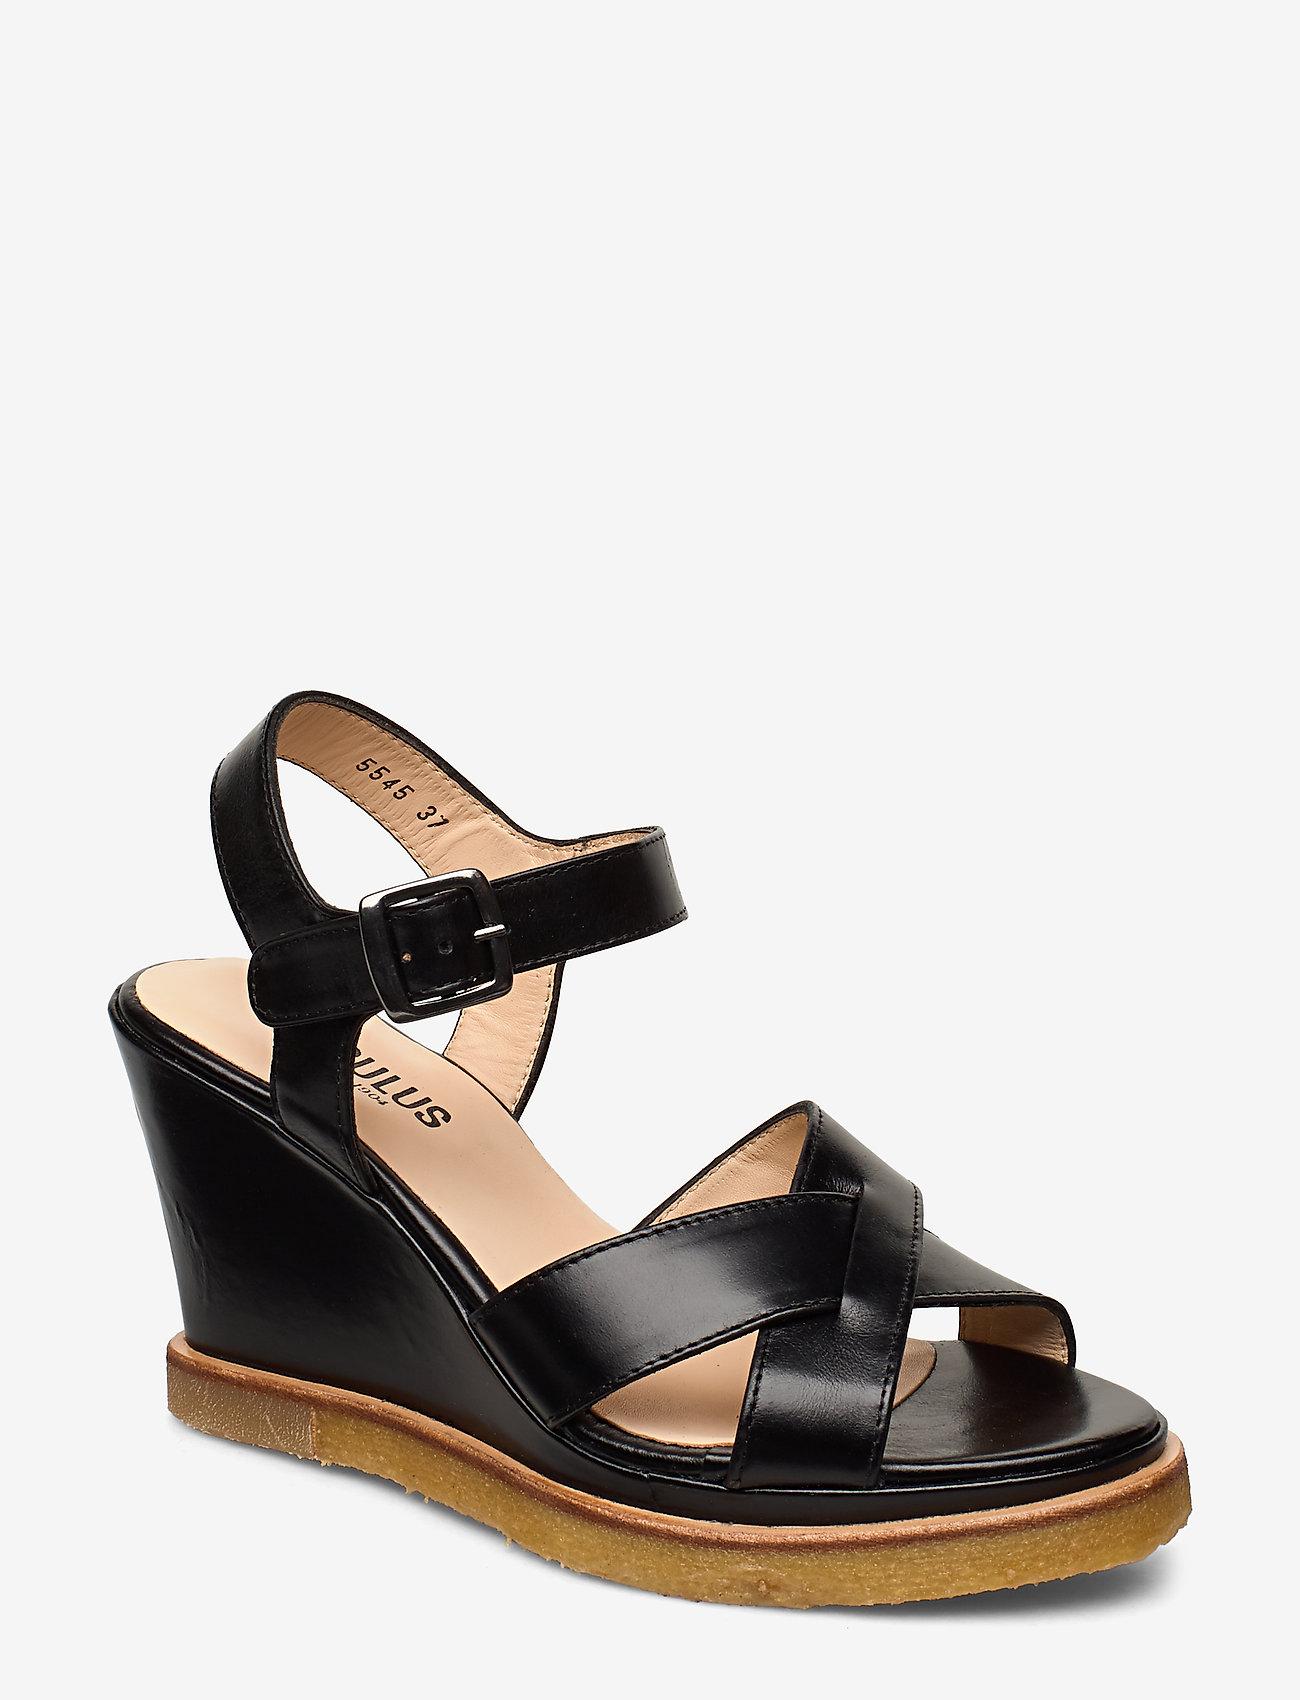 ANGULUS - Sandals - wedge - wedges - 1835 black - 0